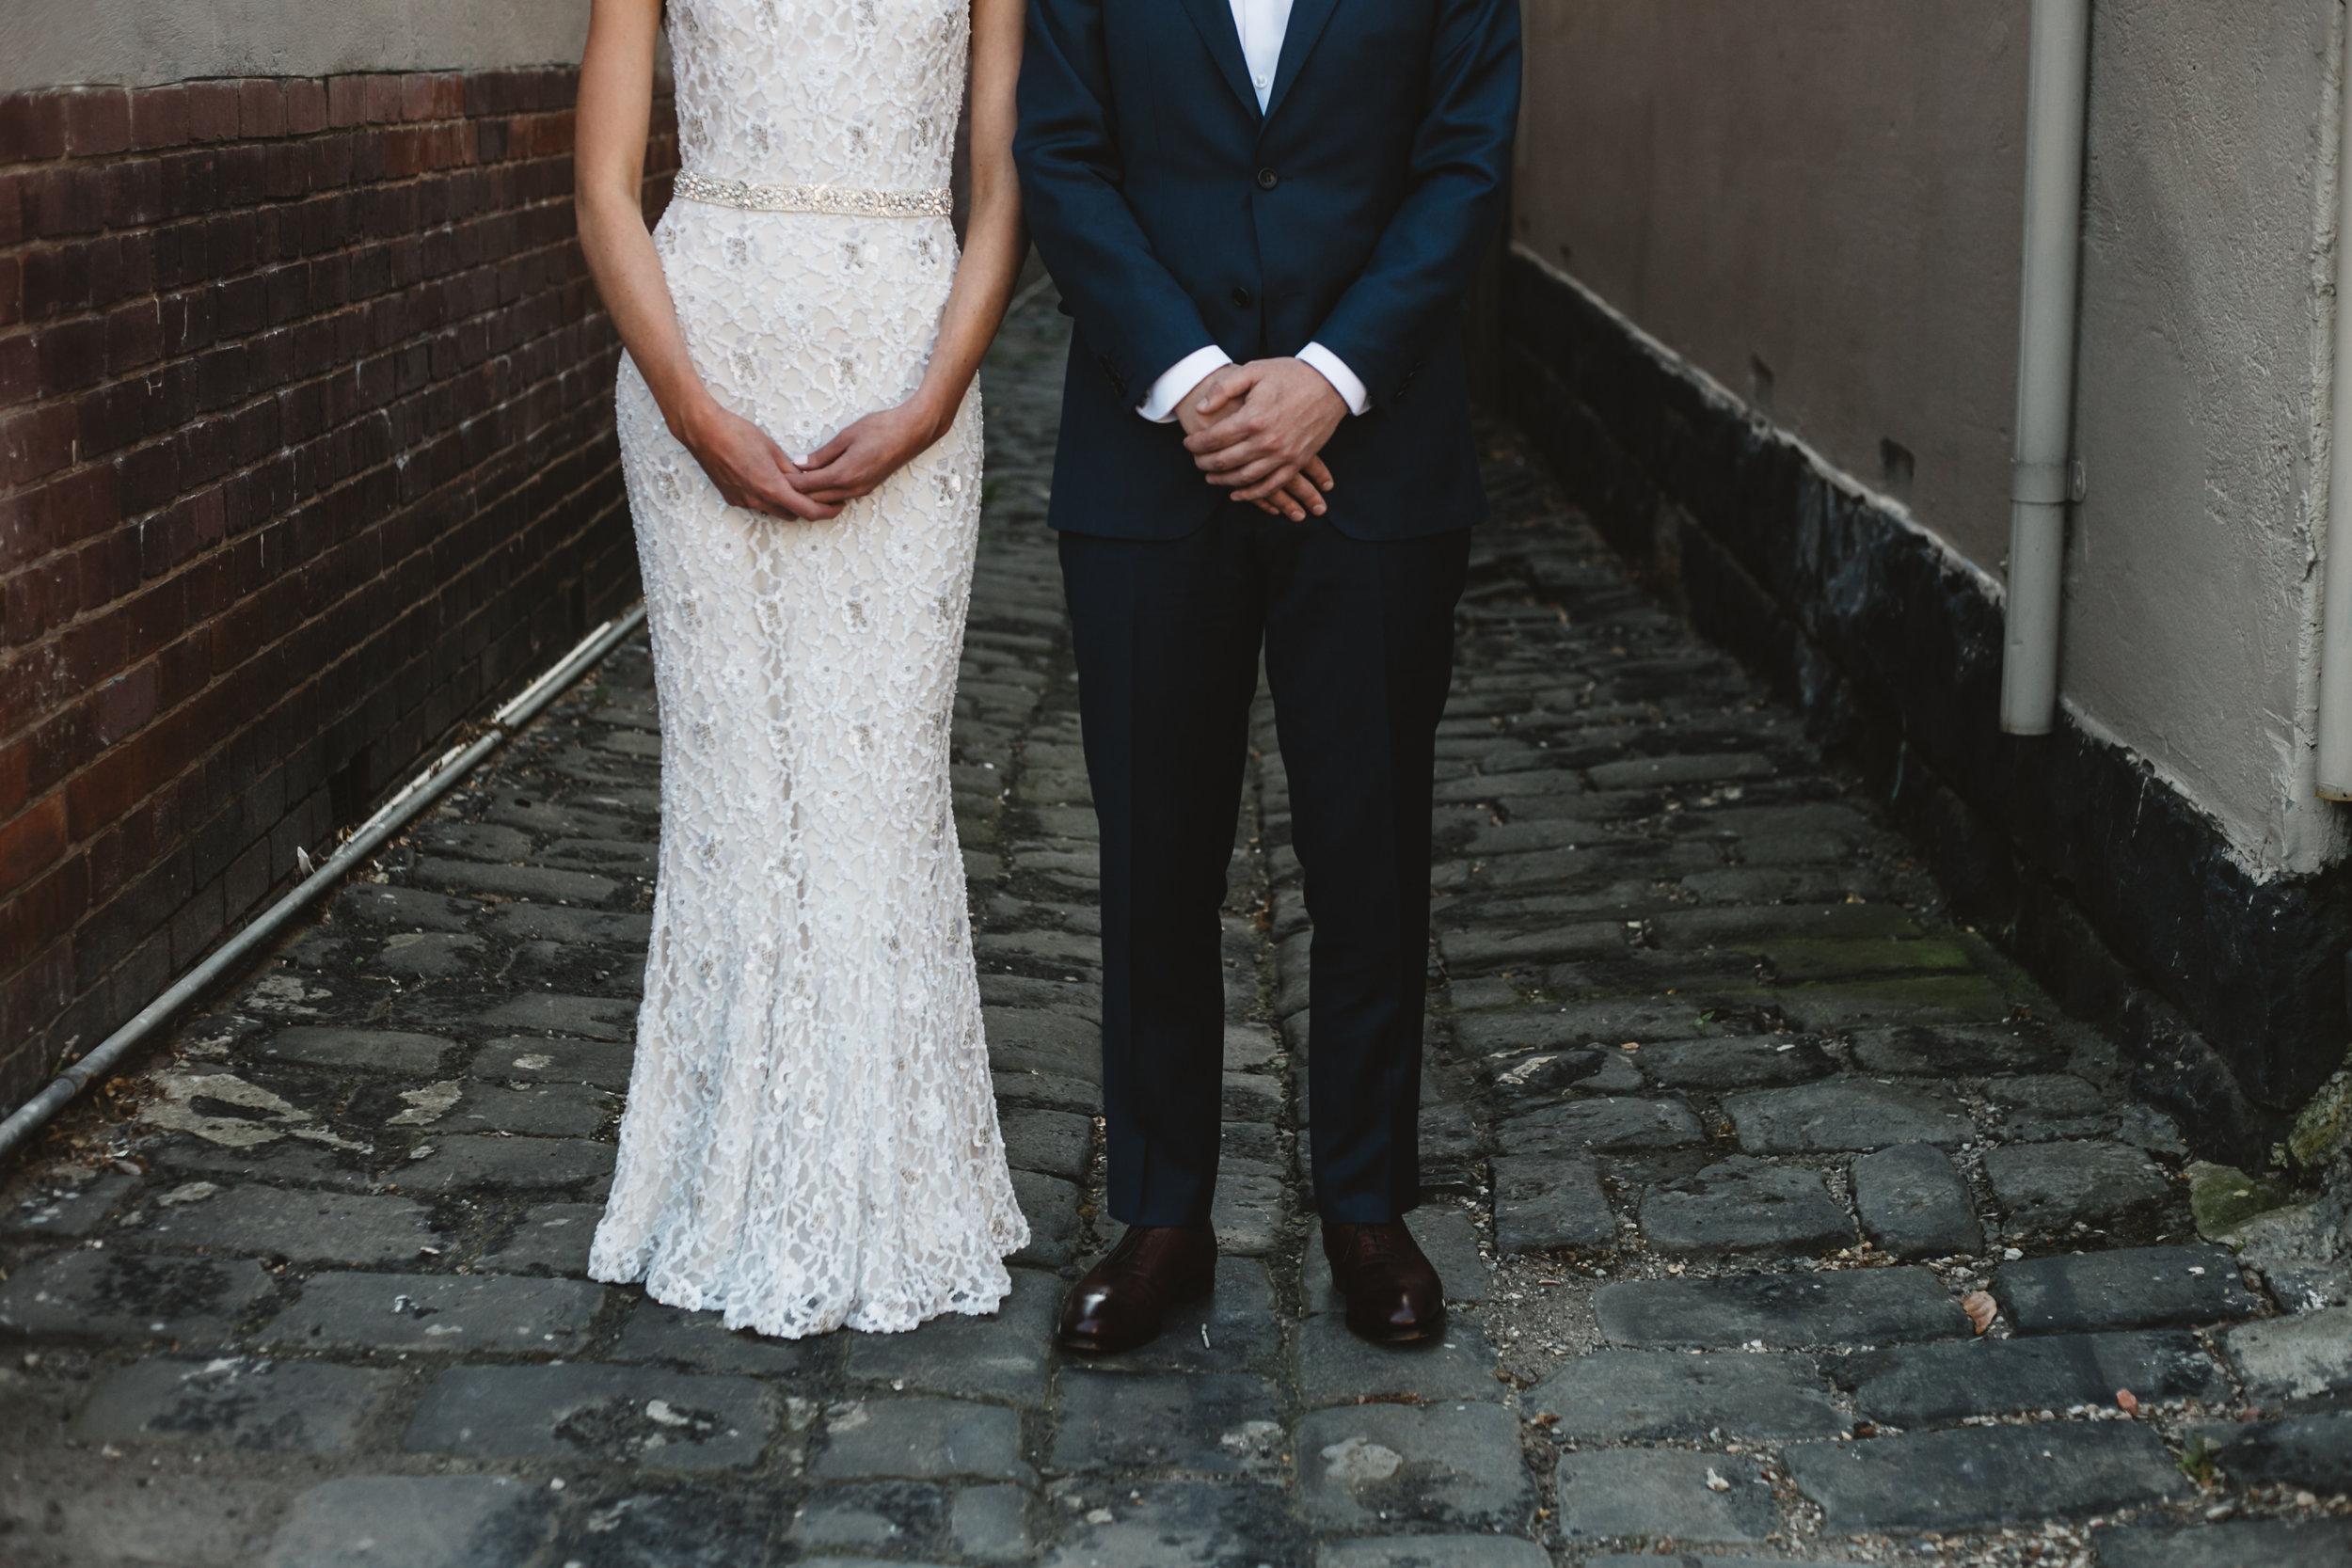 urban weddings in melbourne alleyways and Fitzroy